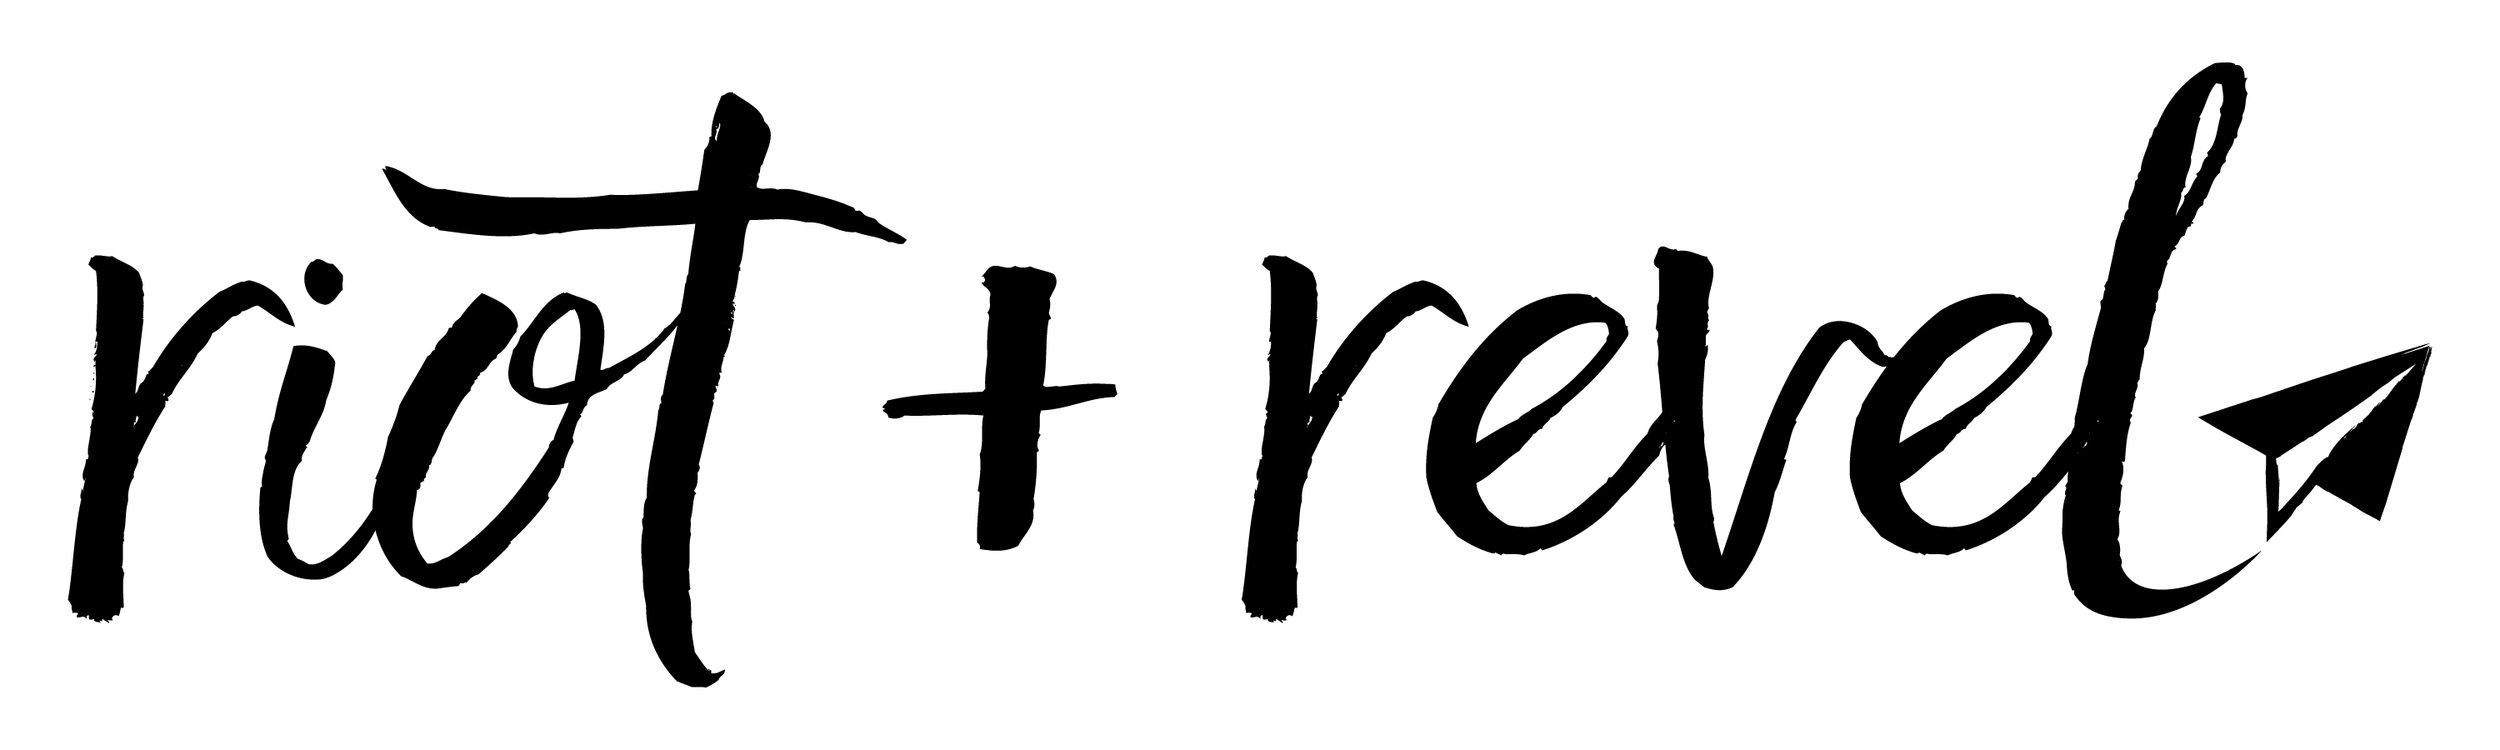 R&R-0208_Logotype1black.jpg